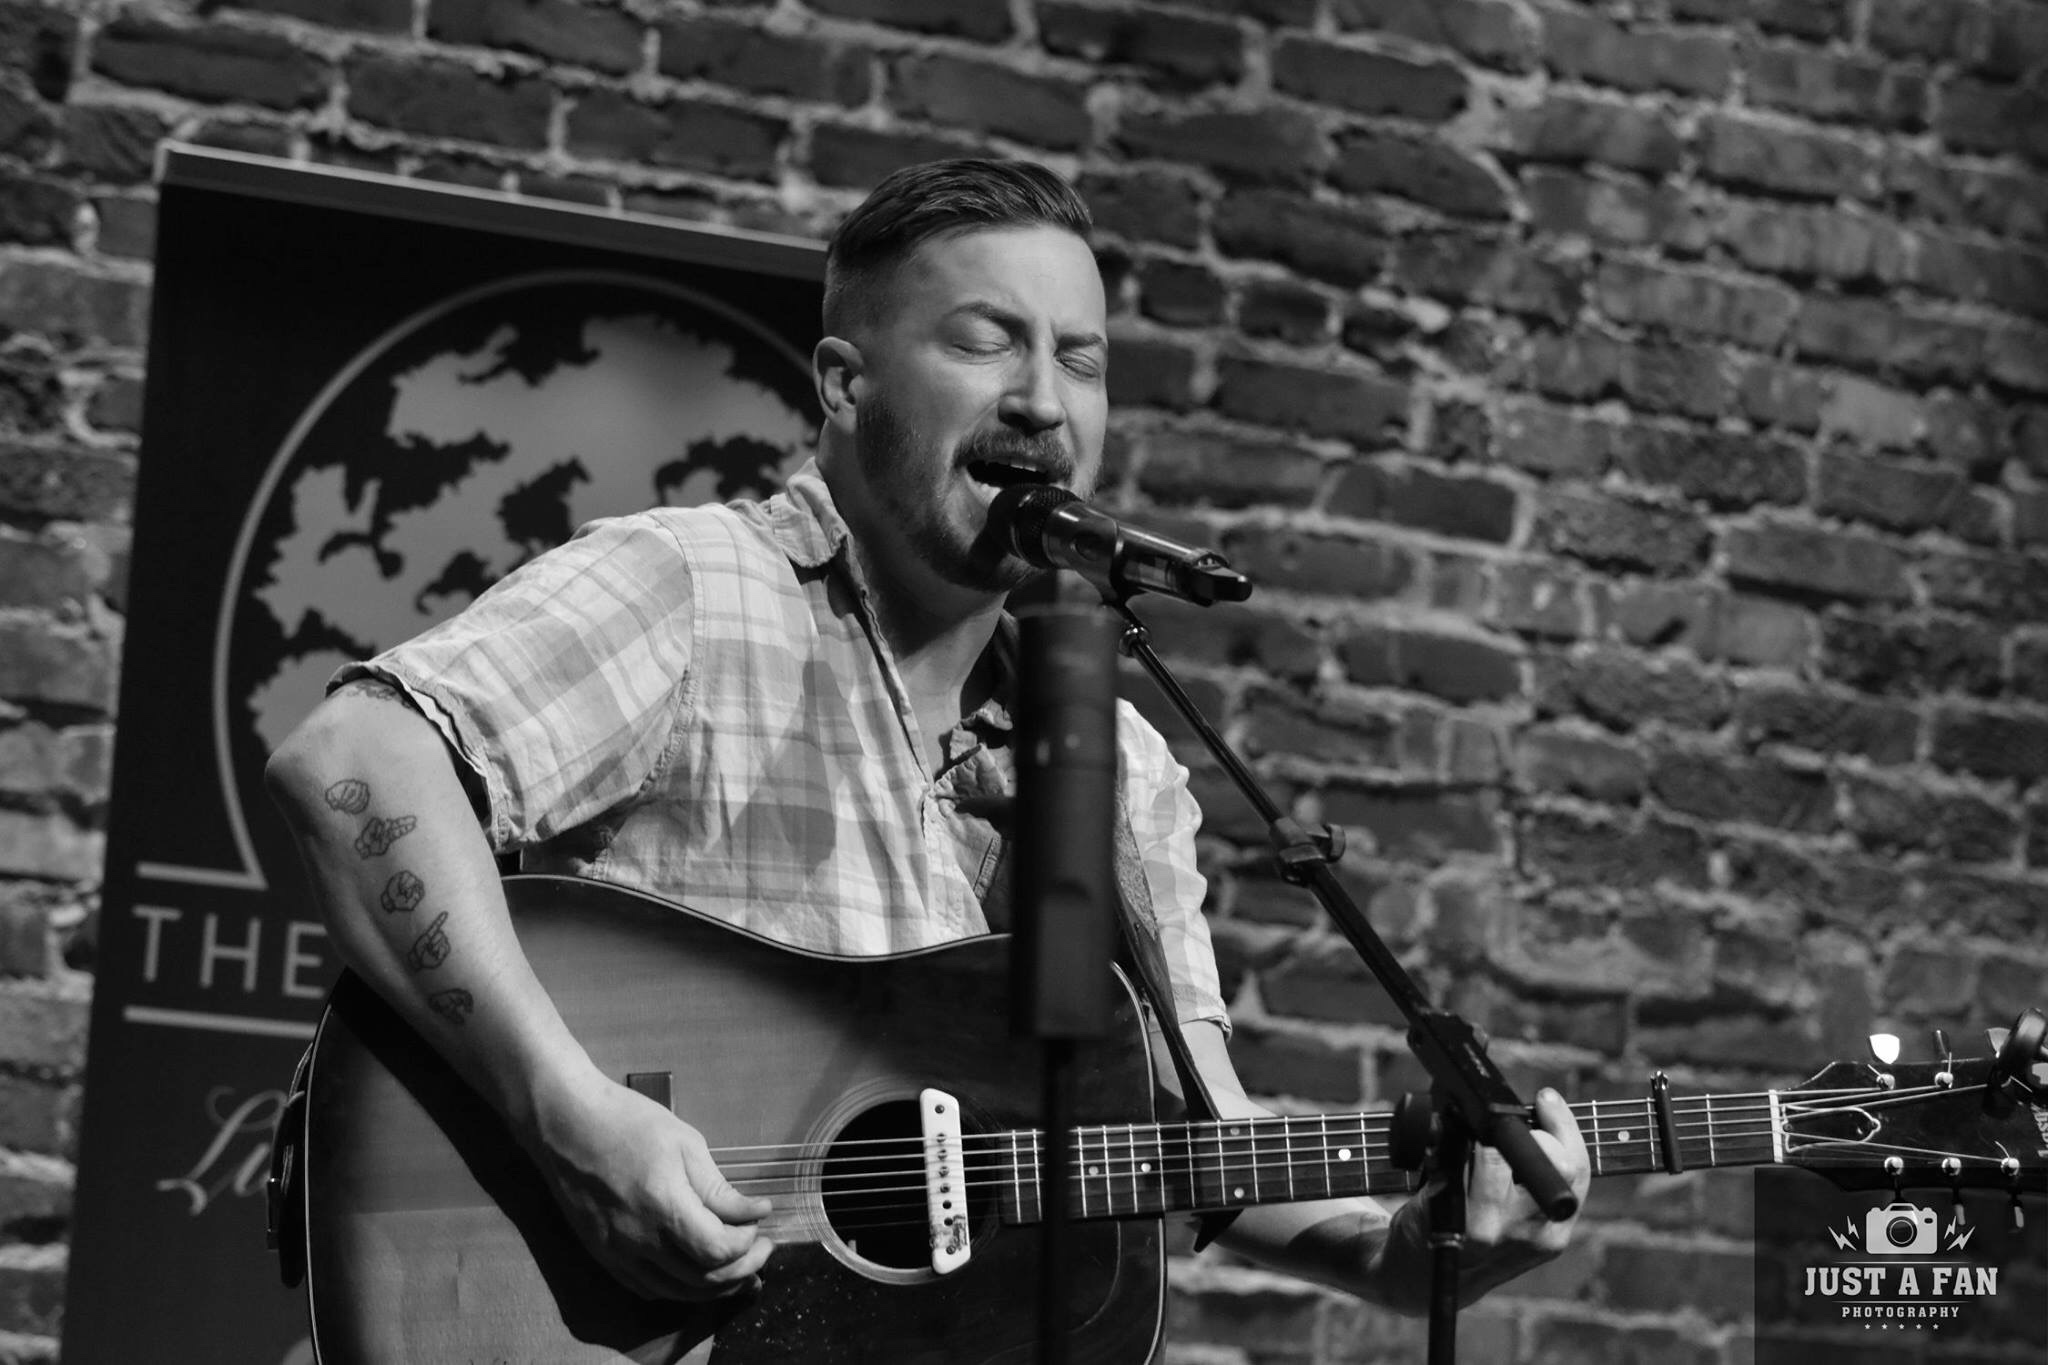 Greg Shaddix - The Mockingbird Podcast